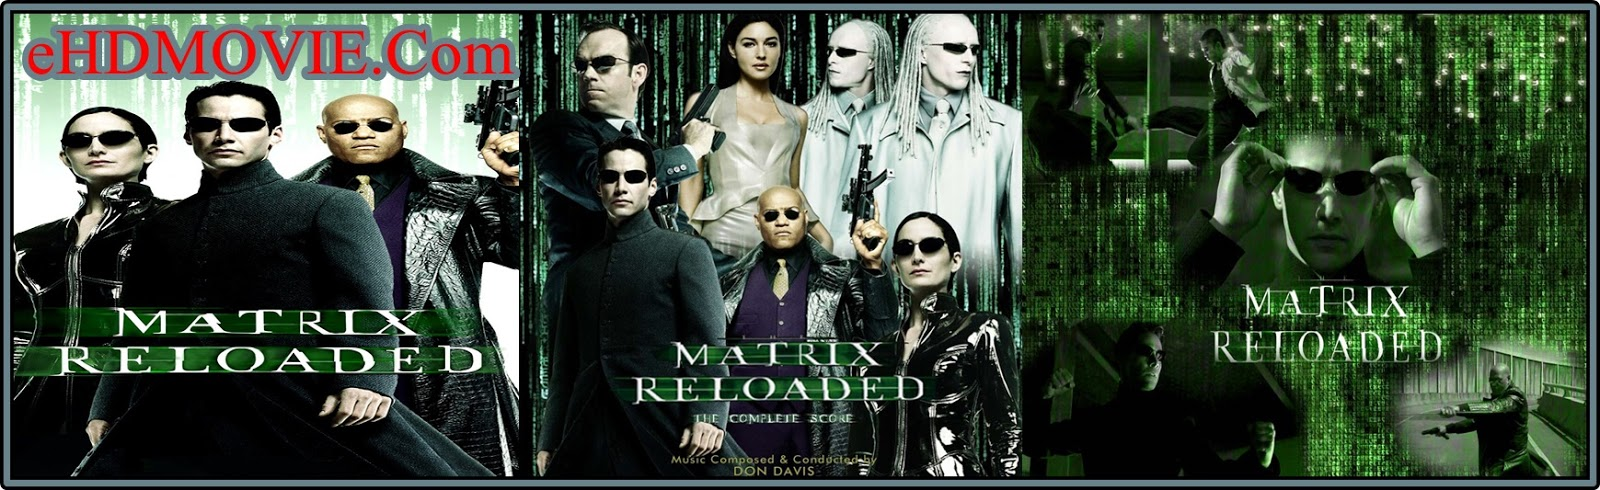 The Matrix Reloaded 2003 Full Movie Dual Audio [Hindi – English] 720p - 480p ORG BRRip 450MB - 1GB ESubs Free Download